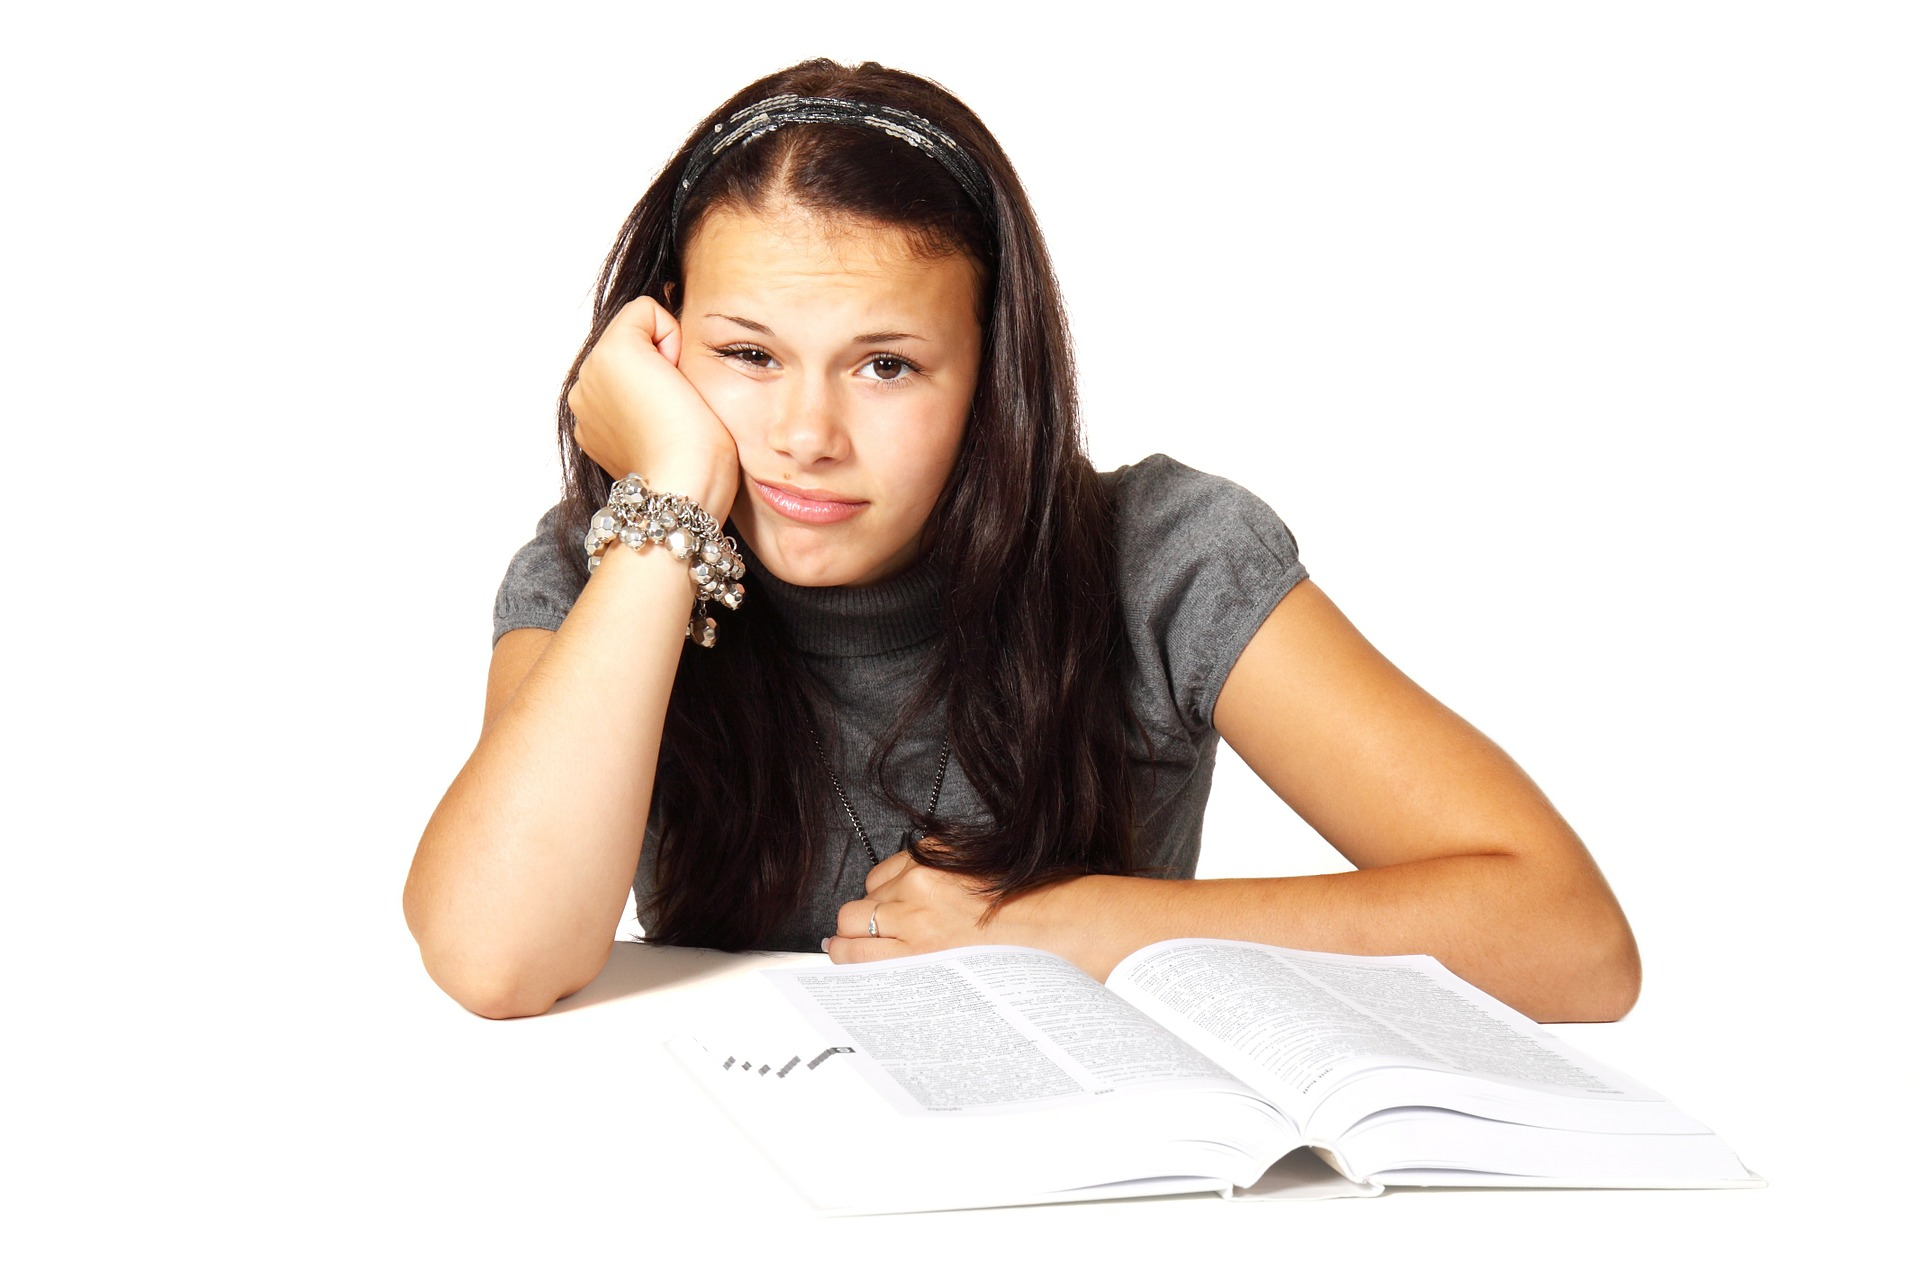 Bored Girl doing revision